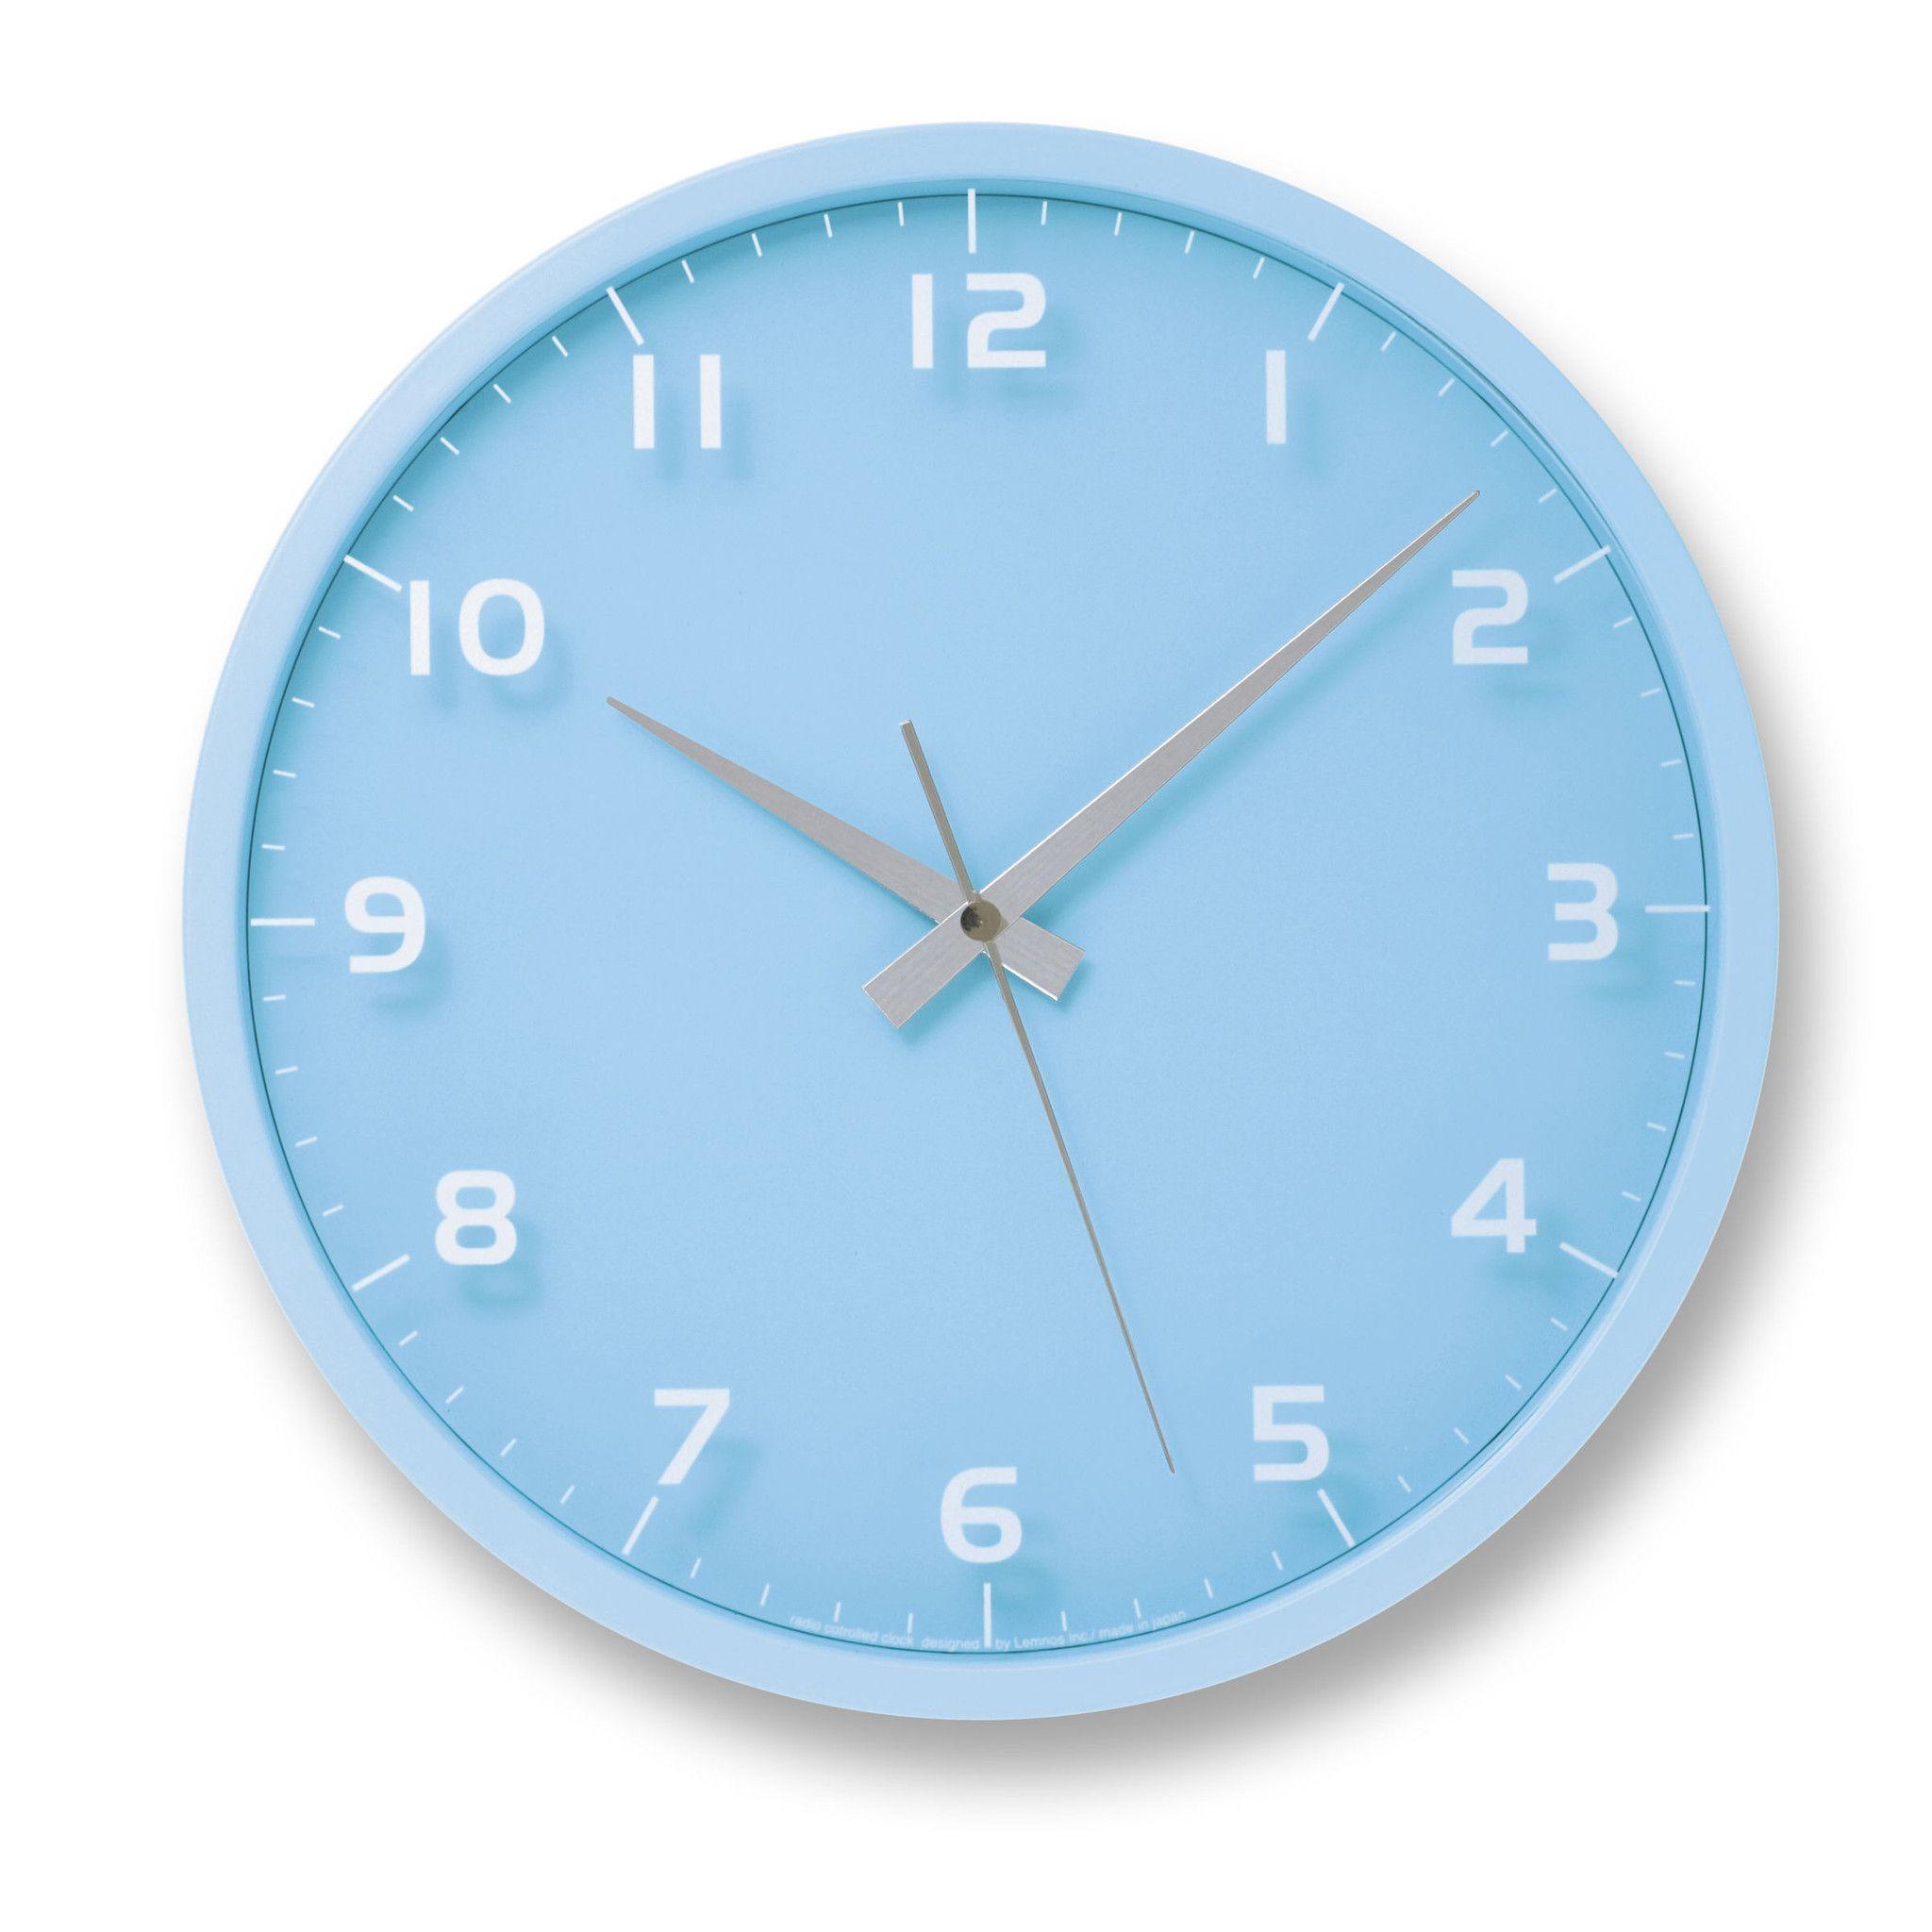 Nine Wall Clock In Light Blue Design By Lemnos Blue Clocks Blue Wall Clocks Light Blue Aesthetic